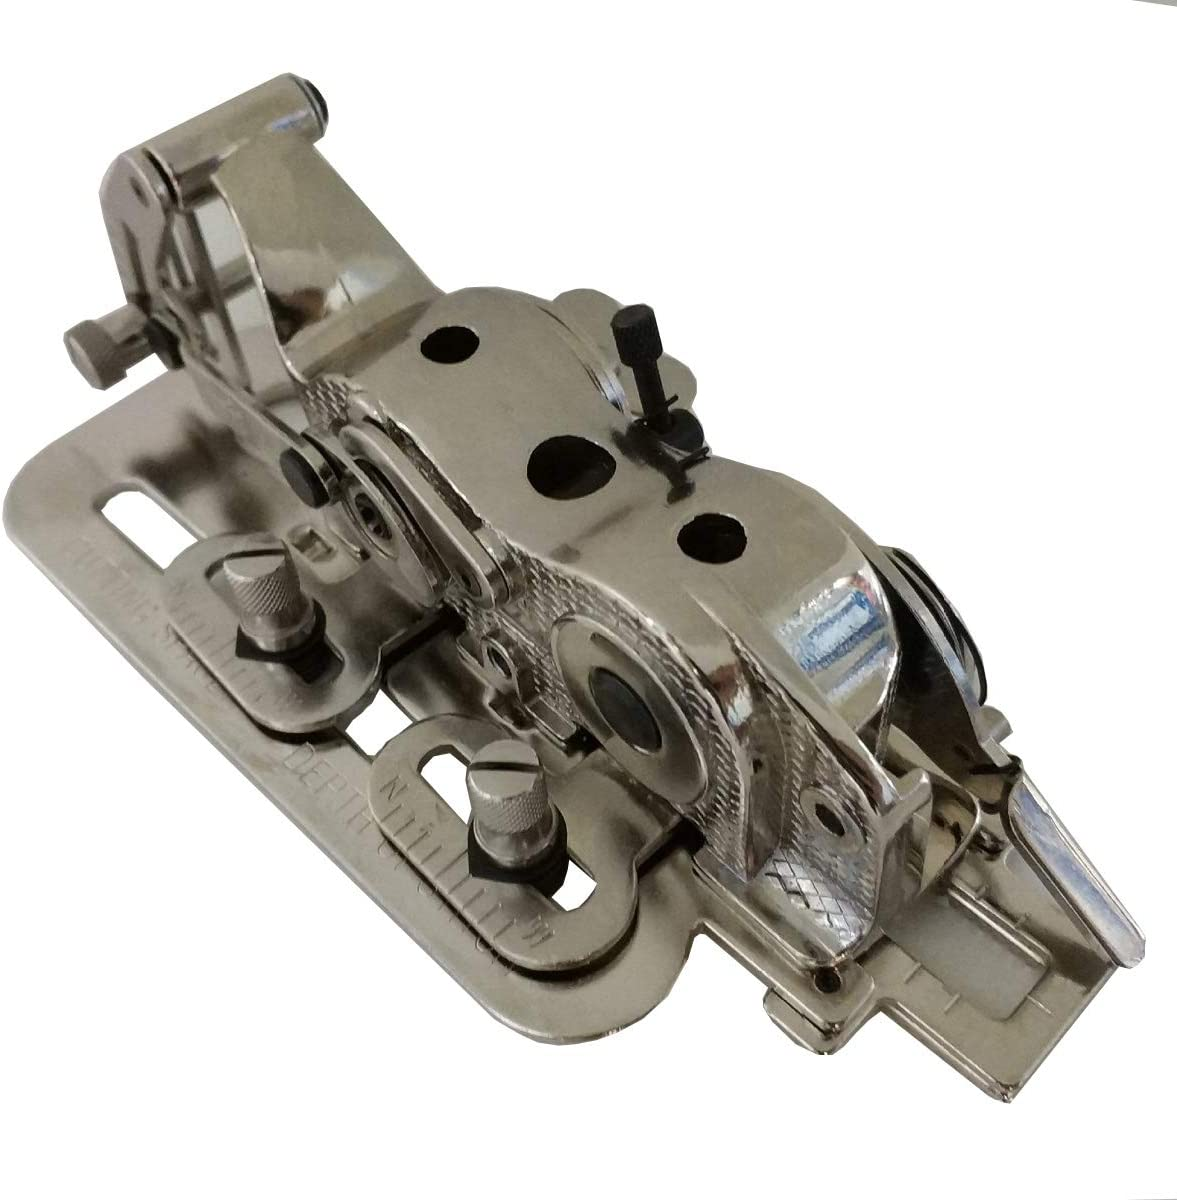 Accesorio semiautomático con ojales para máquina de coser plana ...